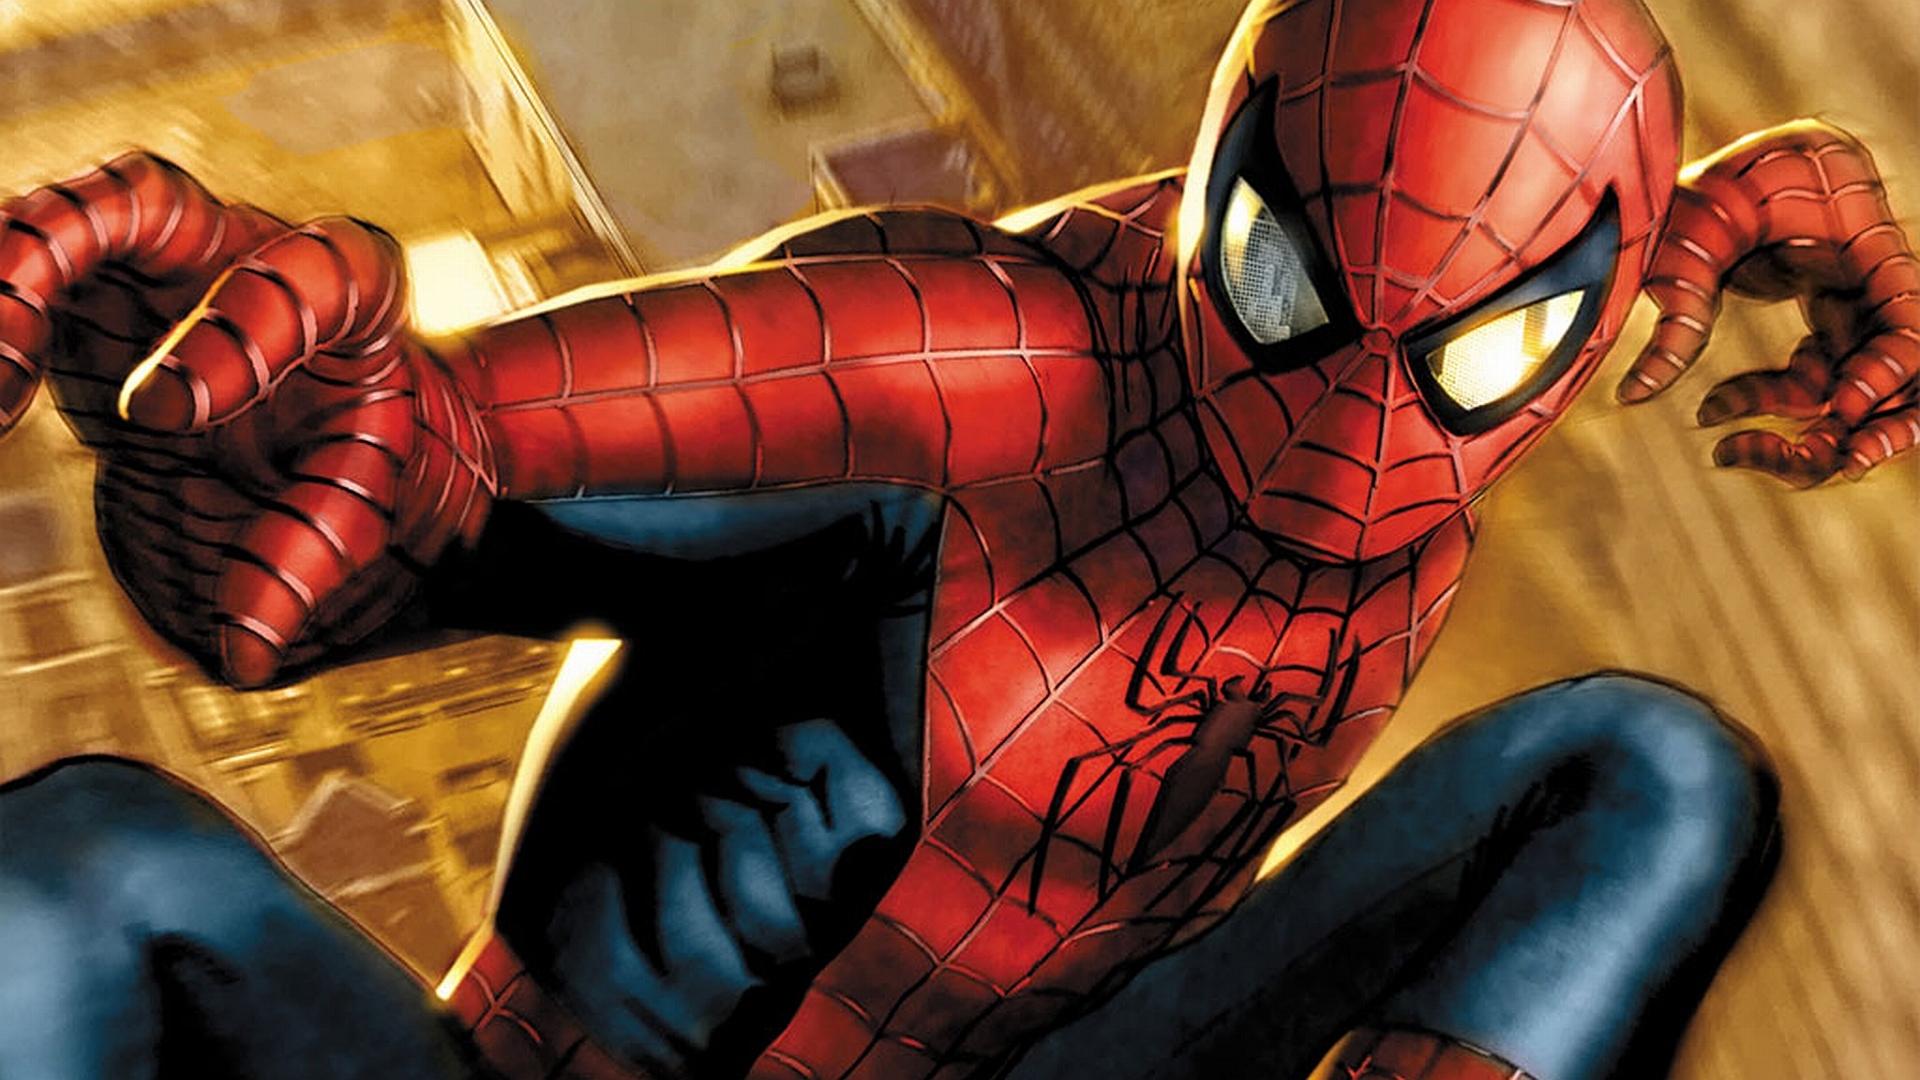 Fondos de pantalla de Spiderman, Wallpapers